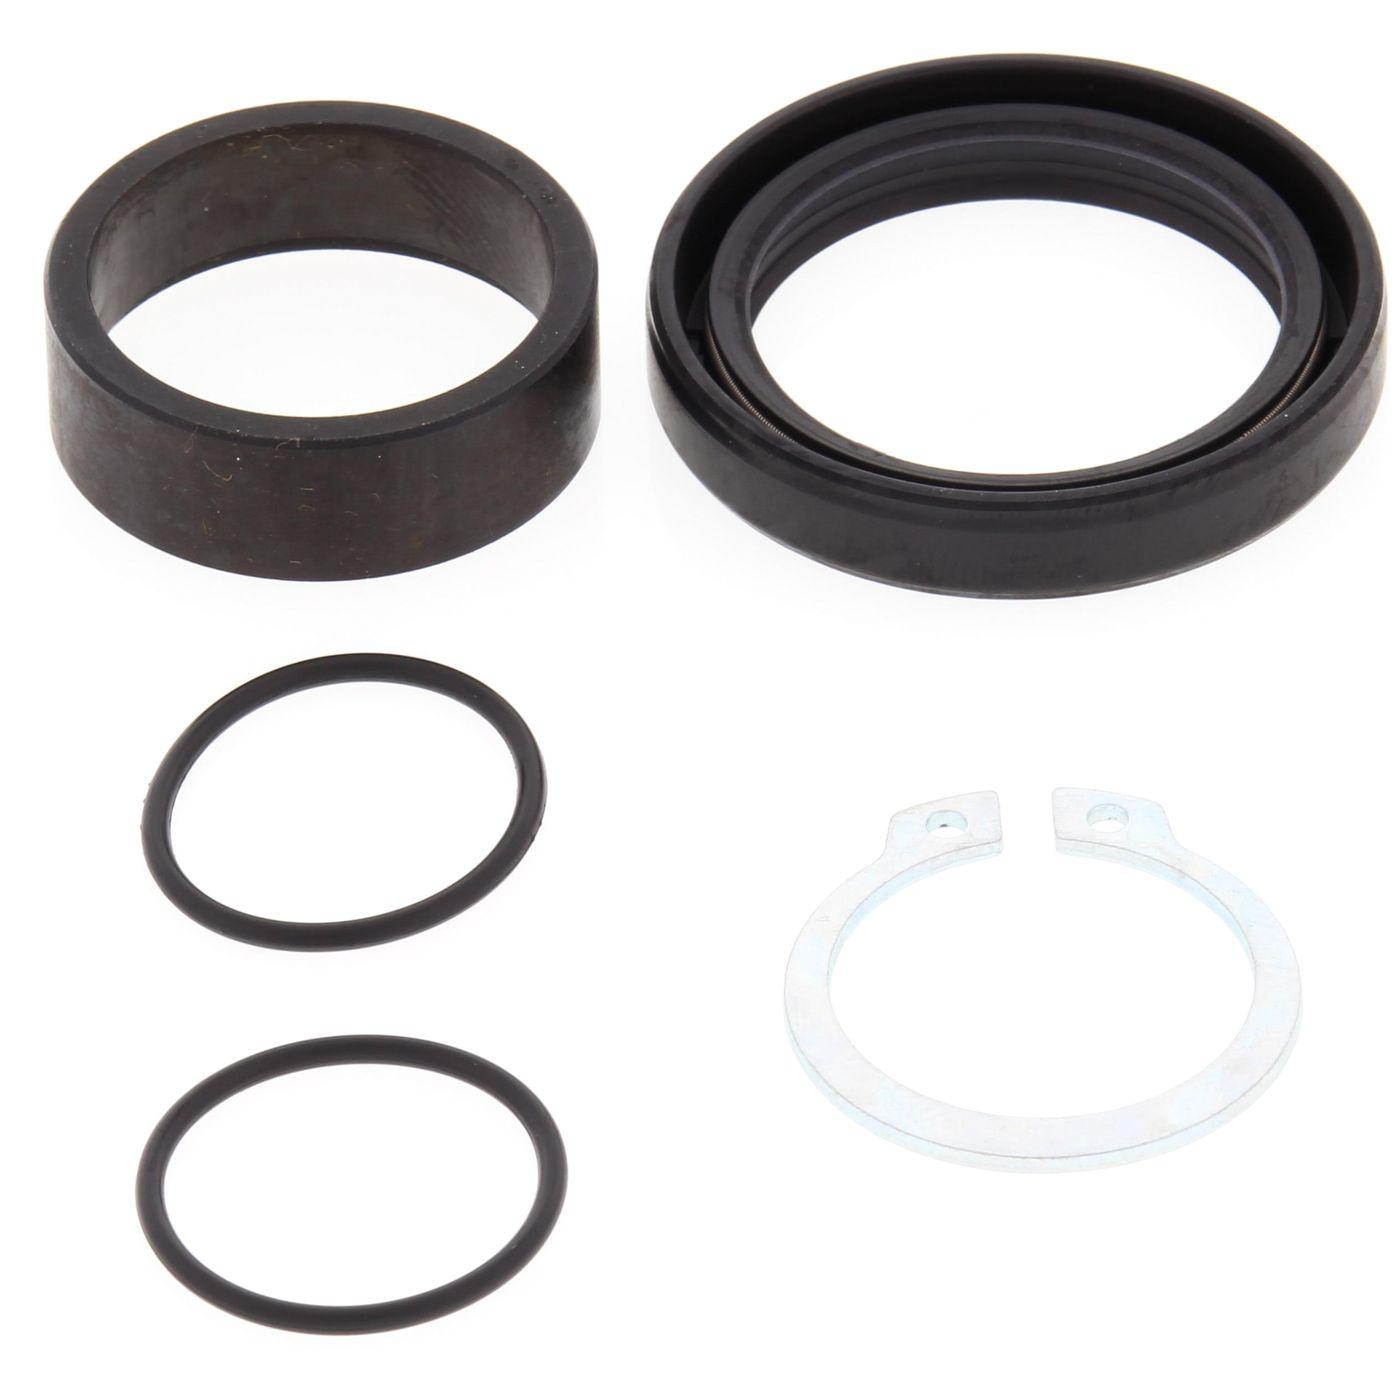 Wrp Drive Shaft Seal Kits - WRP254015 image